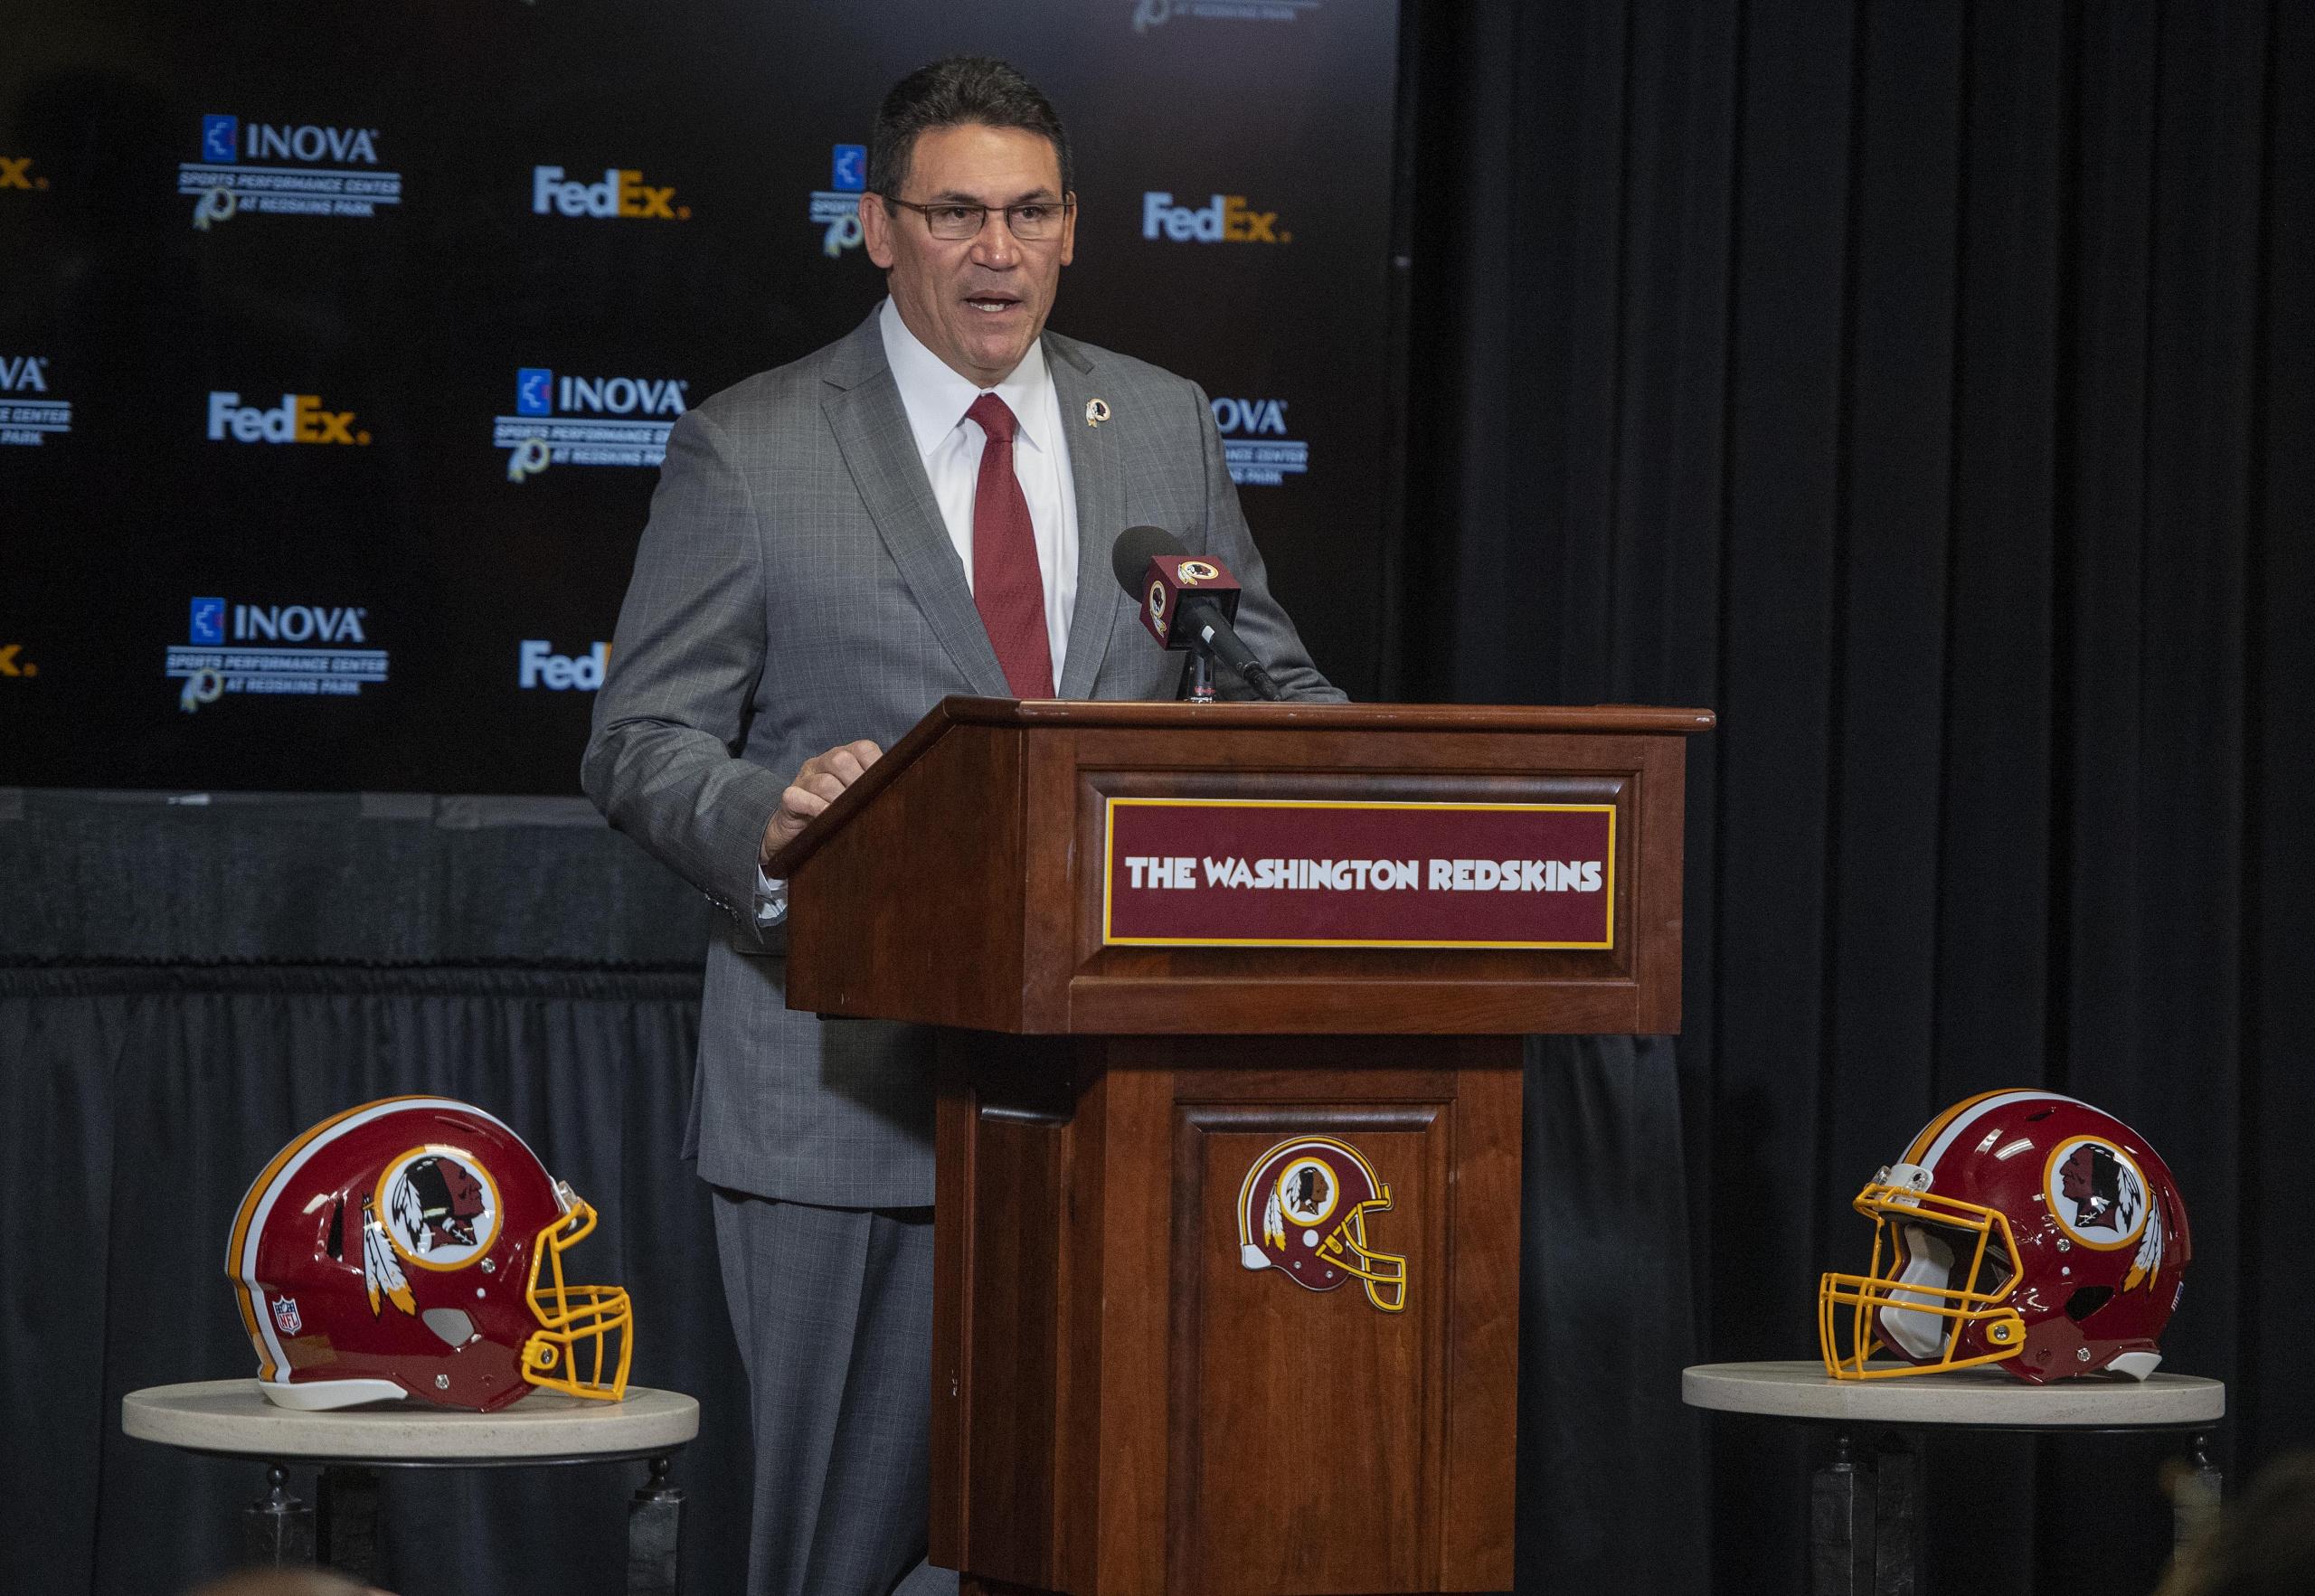 Washignton Redskins 2021 NFL draft